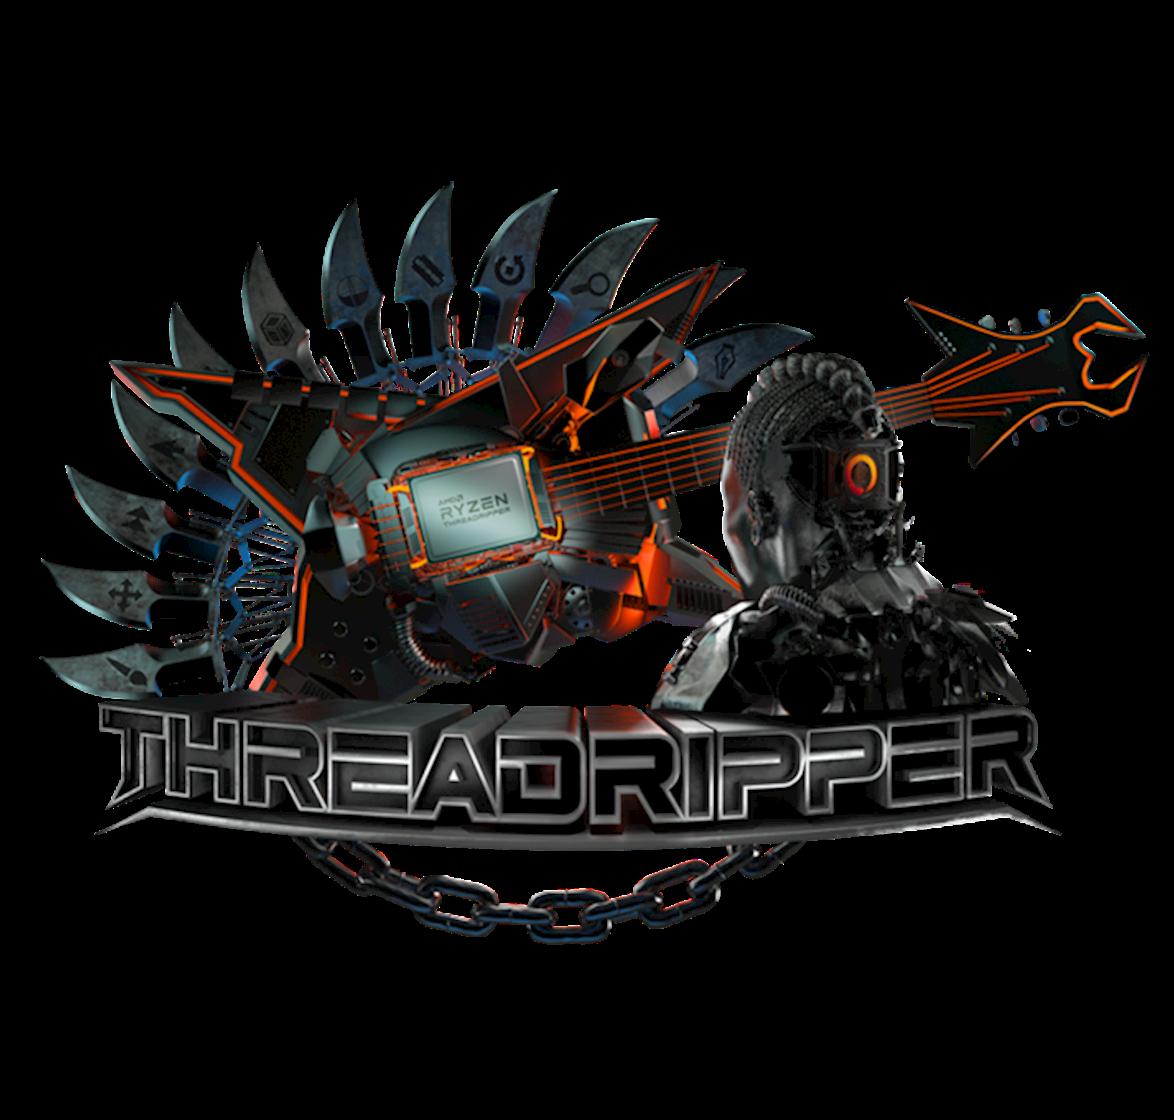 """Designed specifically for threadripper"""